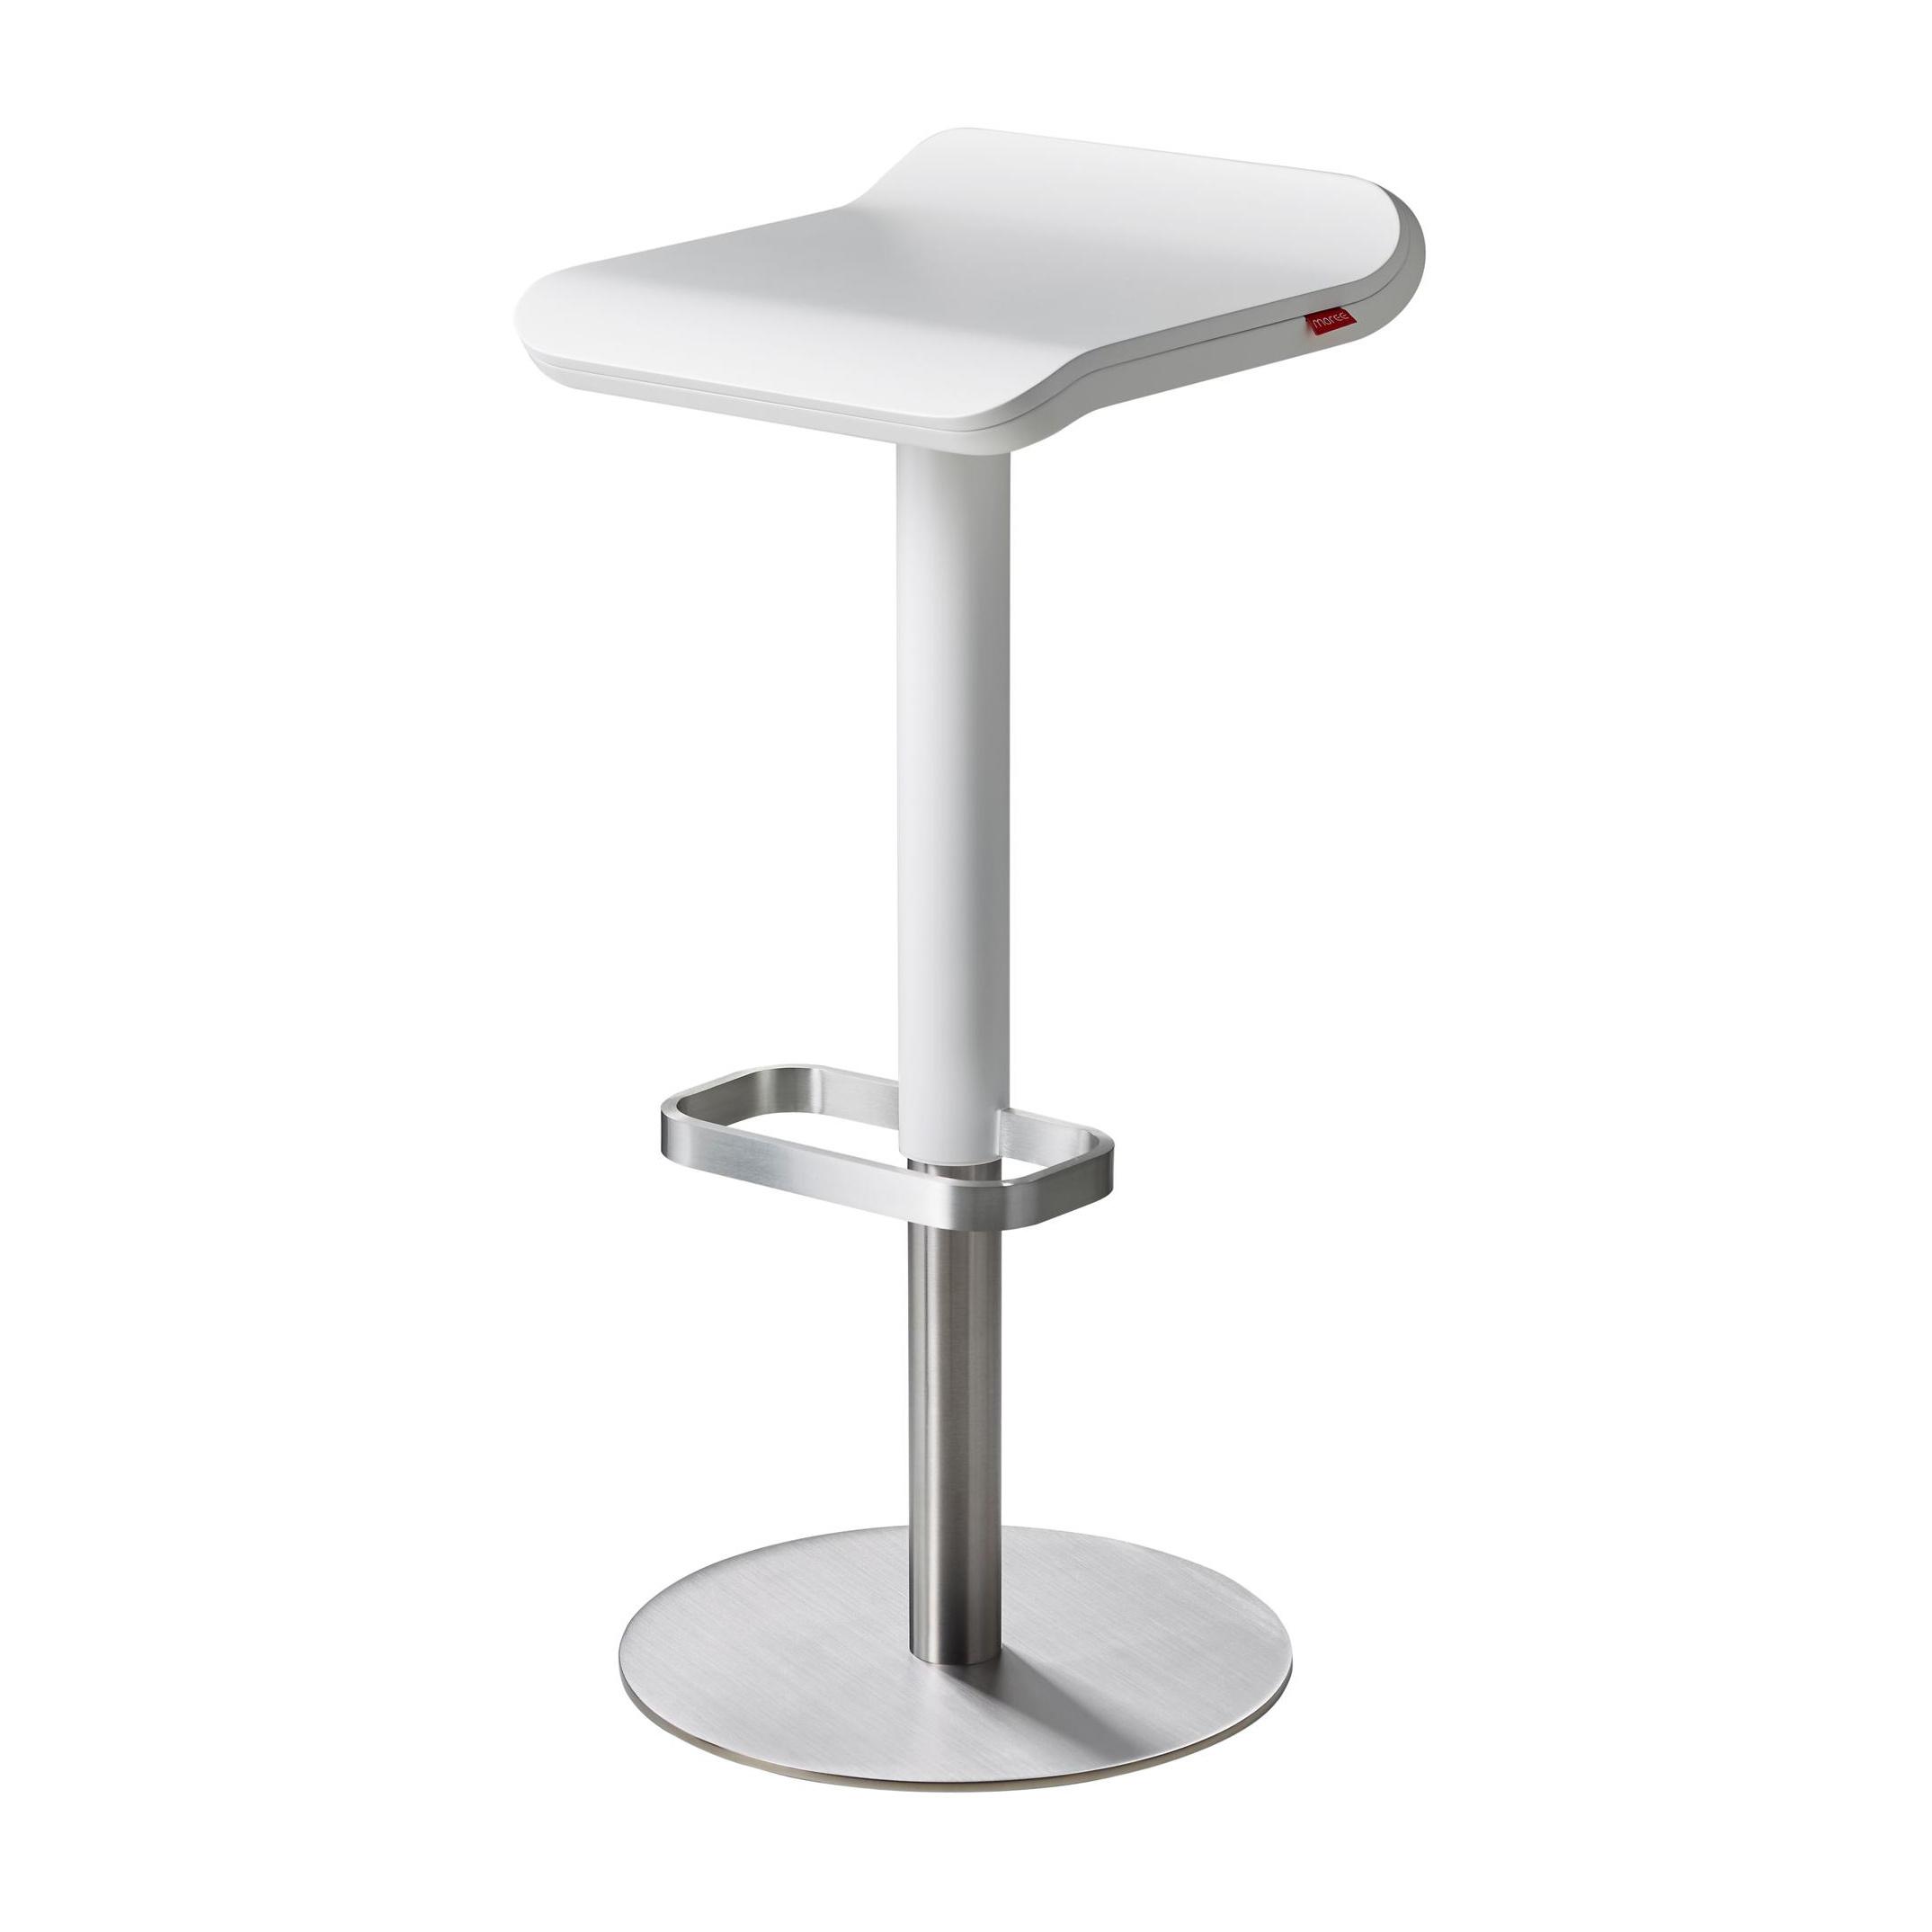 Moree - ED - Tabouret de bar - blanc/siège laqué/max. H81cm/min. H55,5cm/360° rotatif